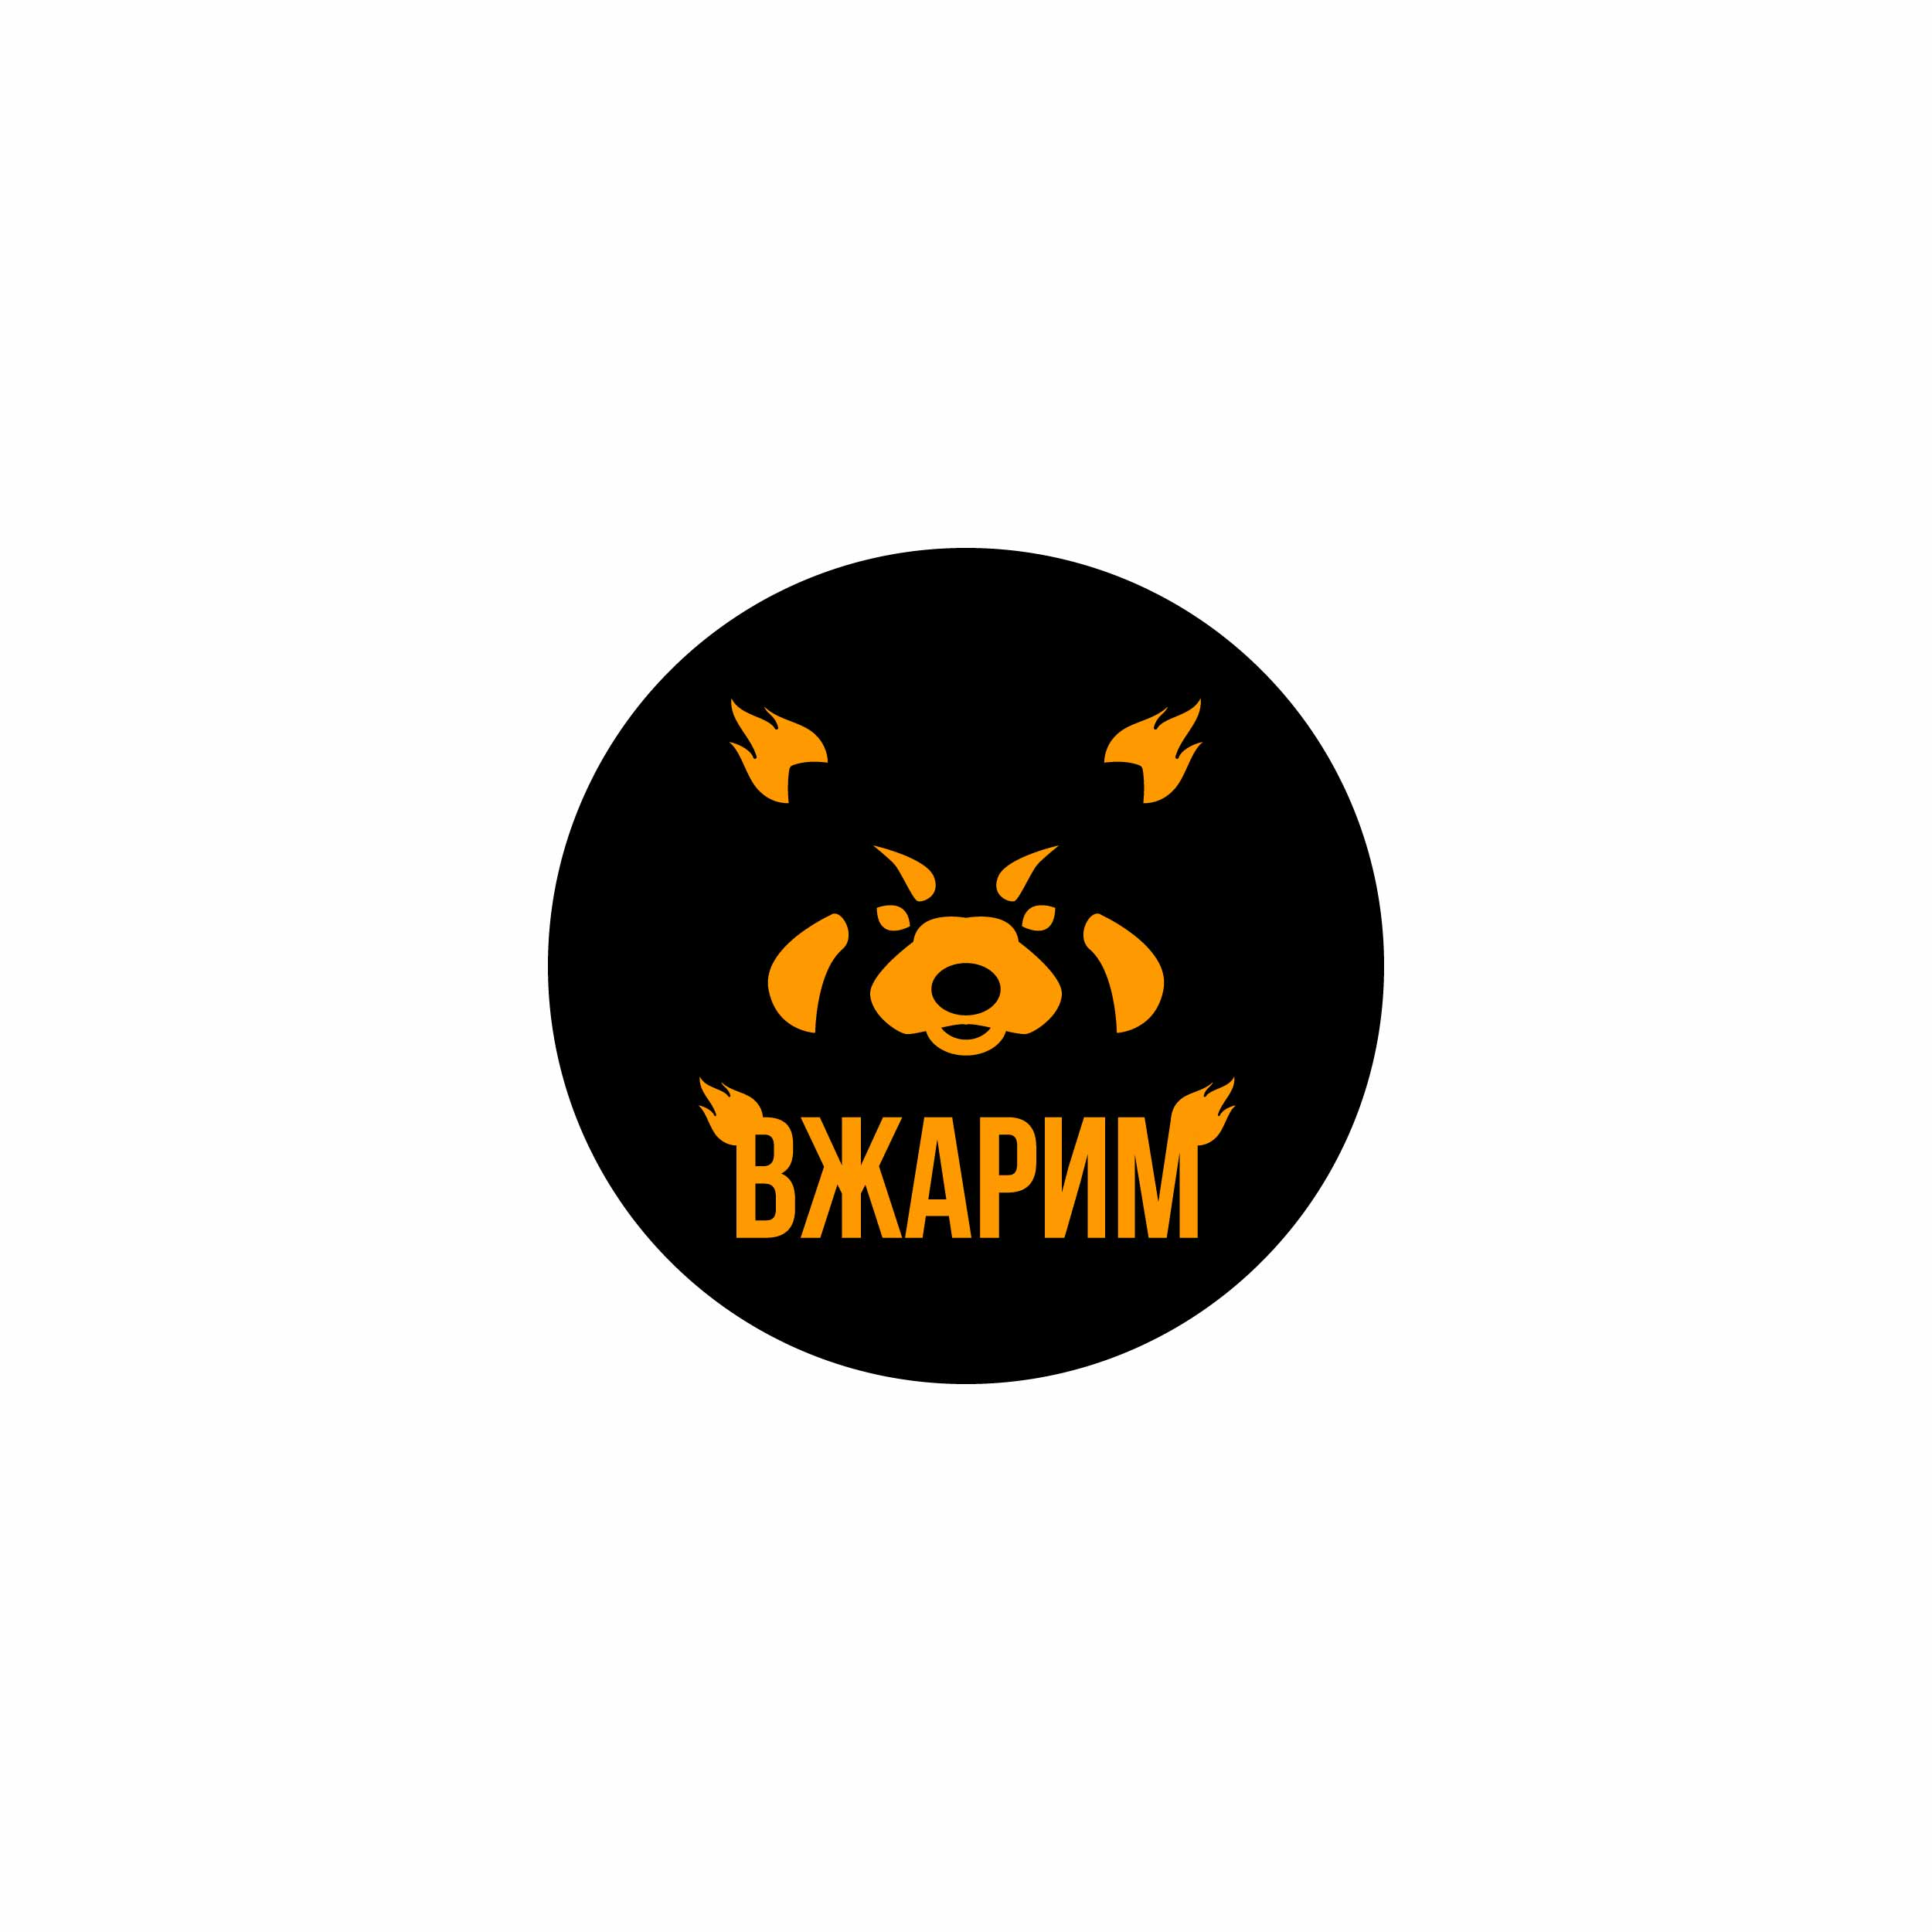 Требуется, разработка логотипа для крафт-кафе «ВЖАРИМ». фото f_496601a087e2241f.jpg